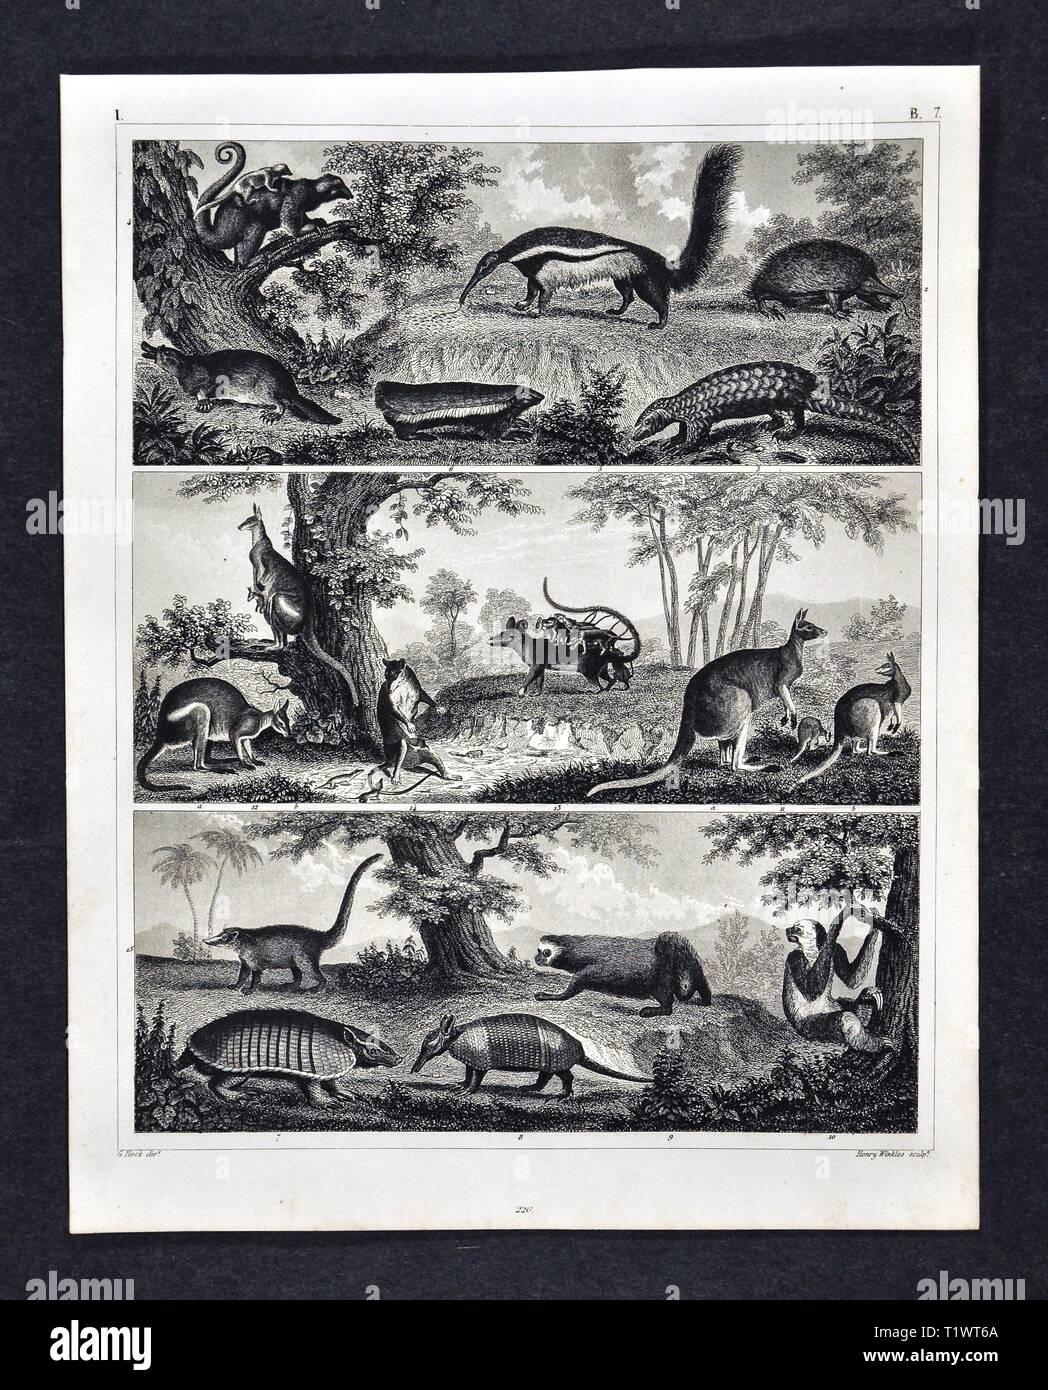 1849 Zoological Print - Wildlife Animals - Mammals Marsupial Kangaroos, Possum, and Armadillos, Pangolin, Platypus, Anteaters and Lemurs - Stock Image